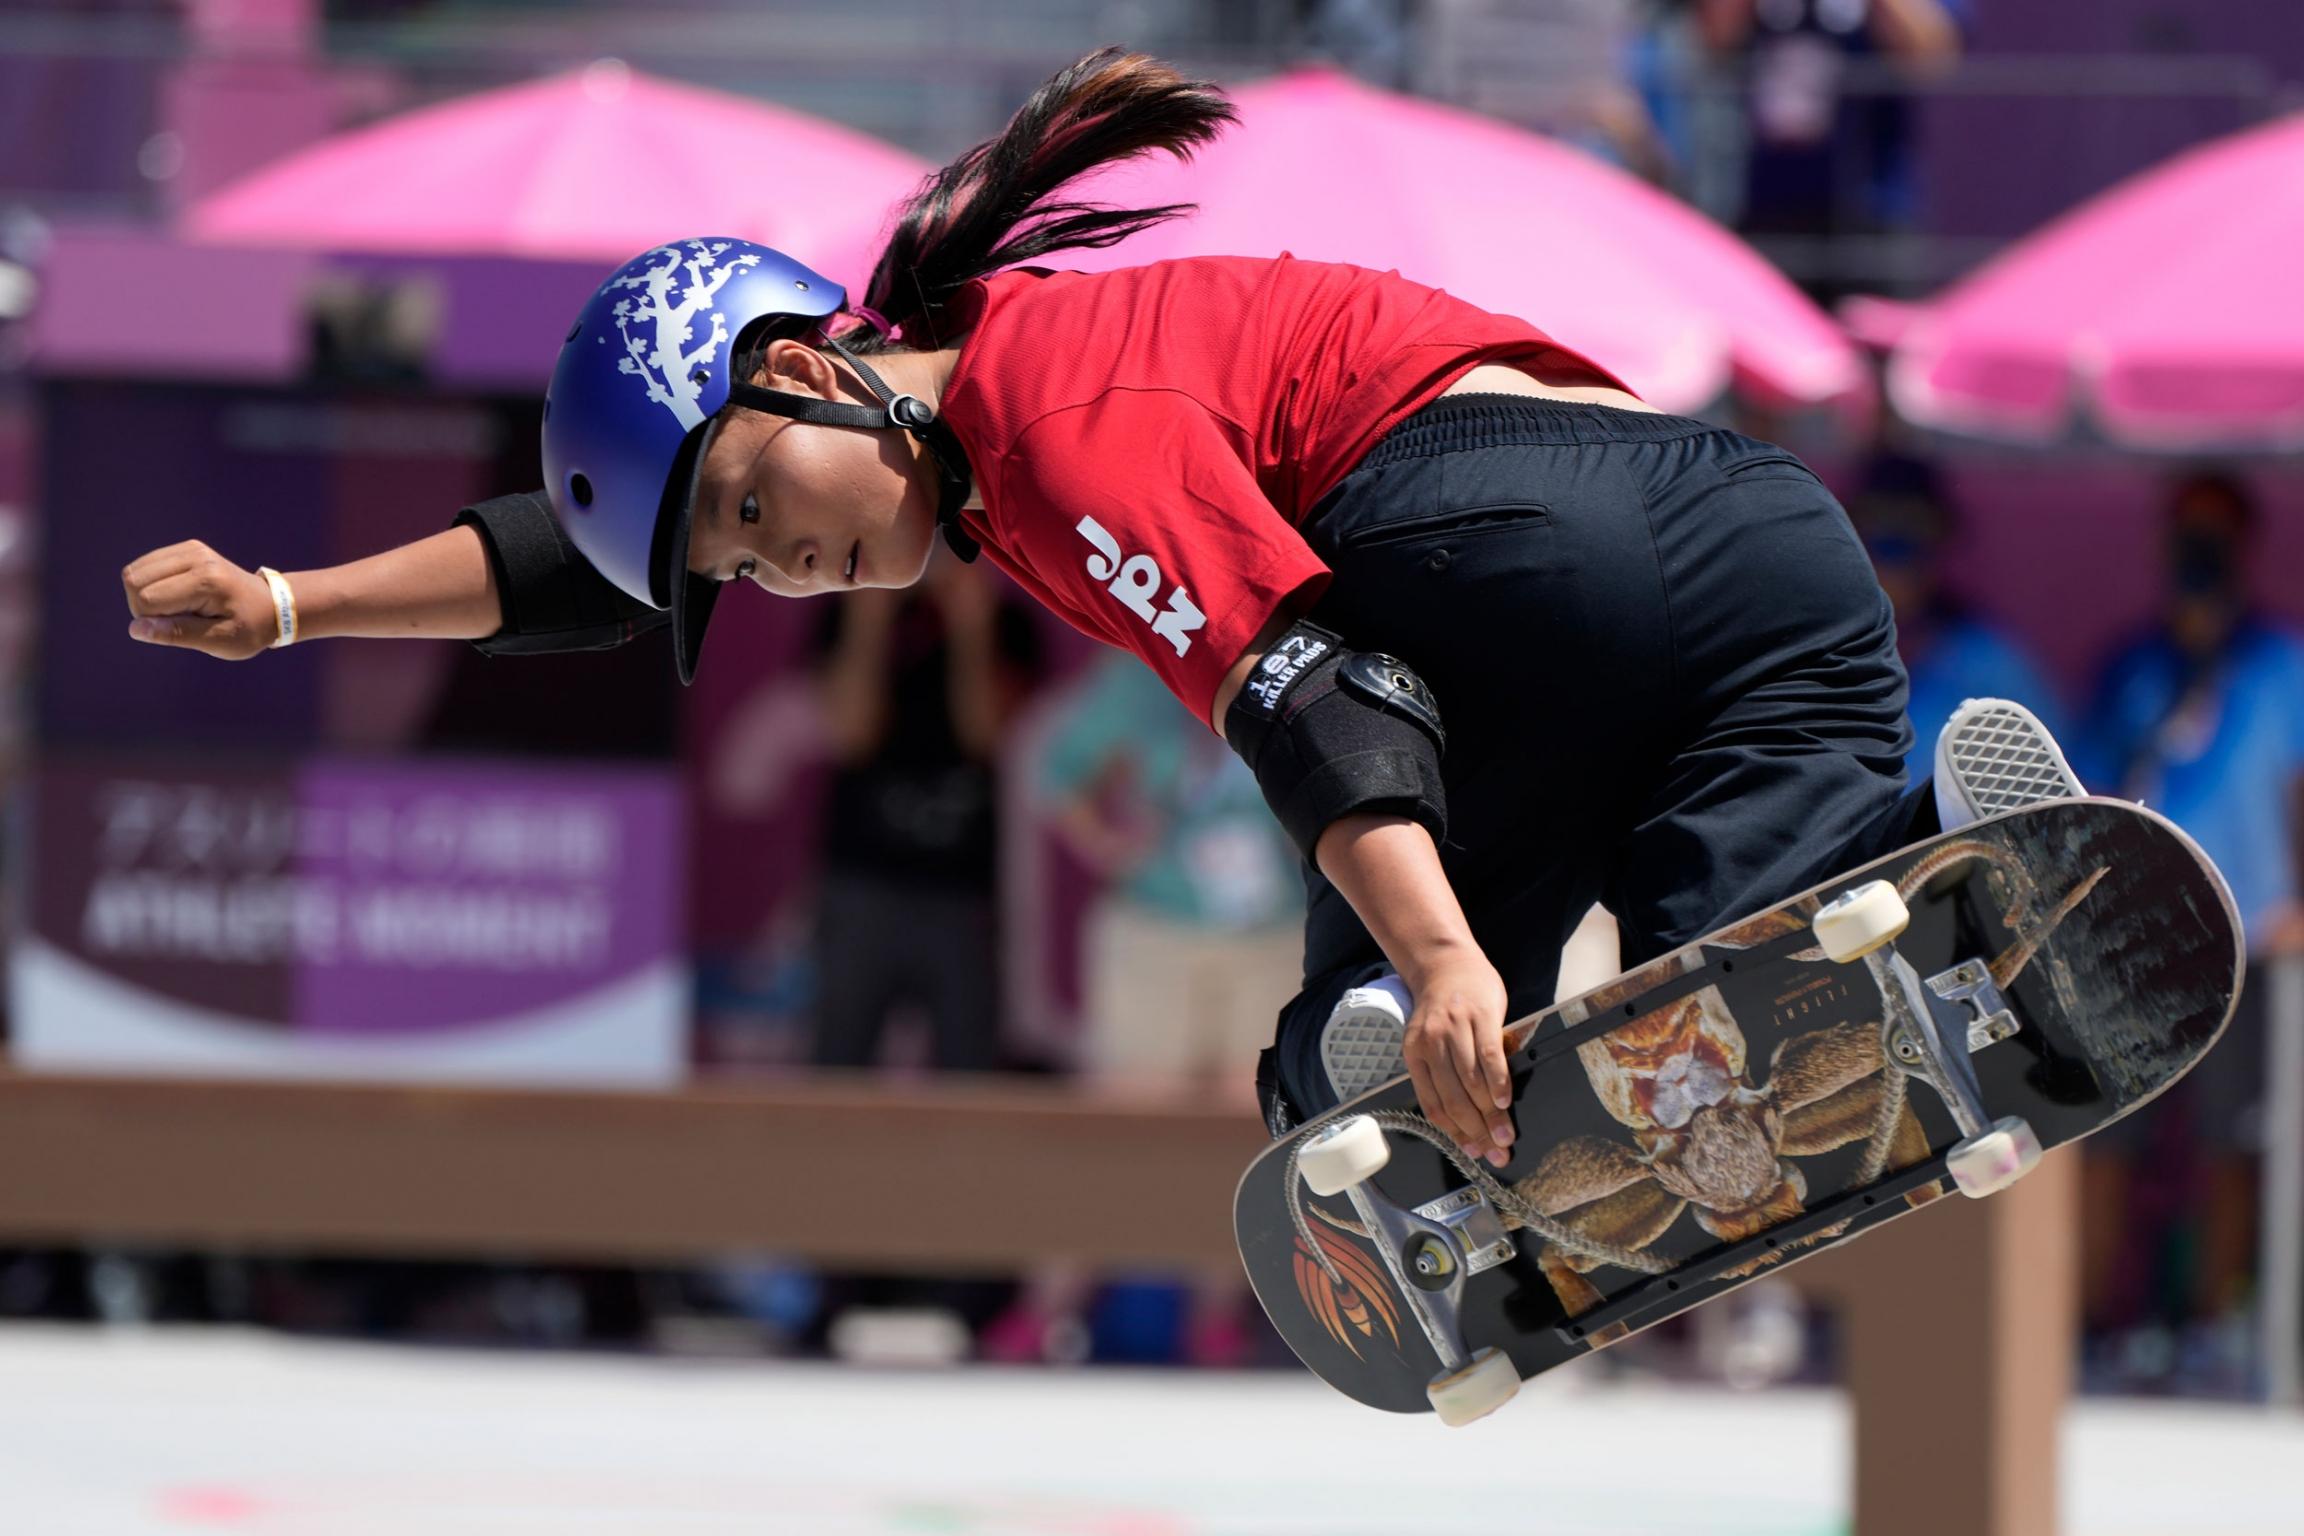 Sakura Yosozumi is shown in mid-air holding her skateboard to her feet.